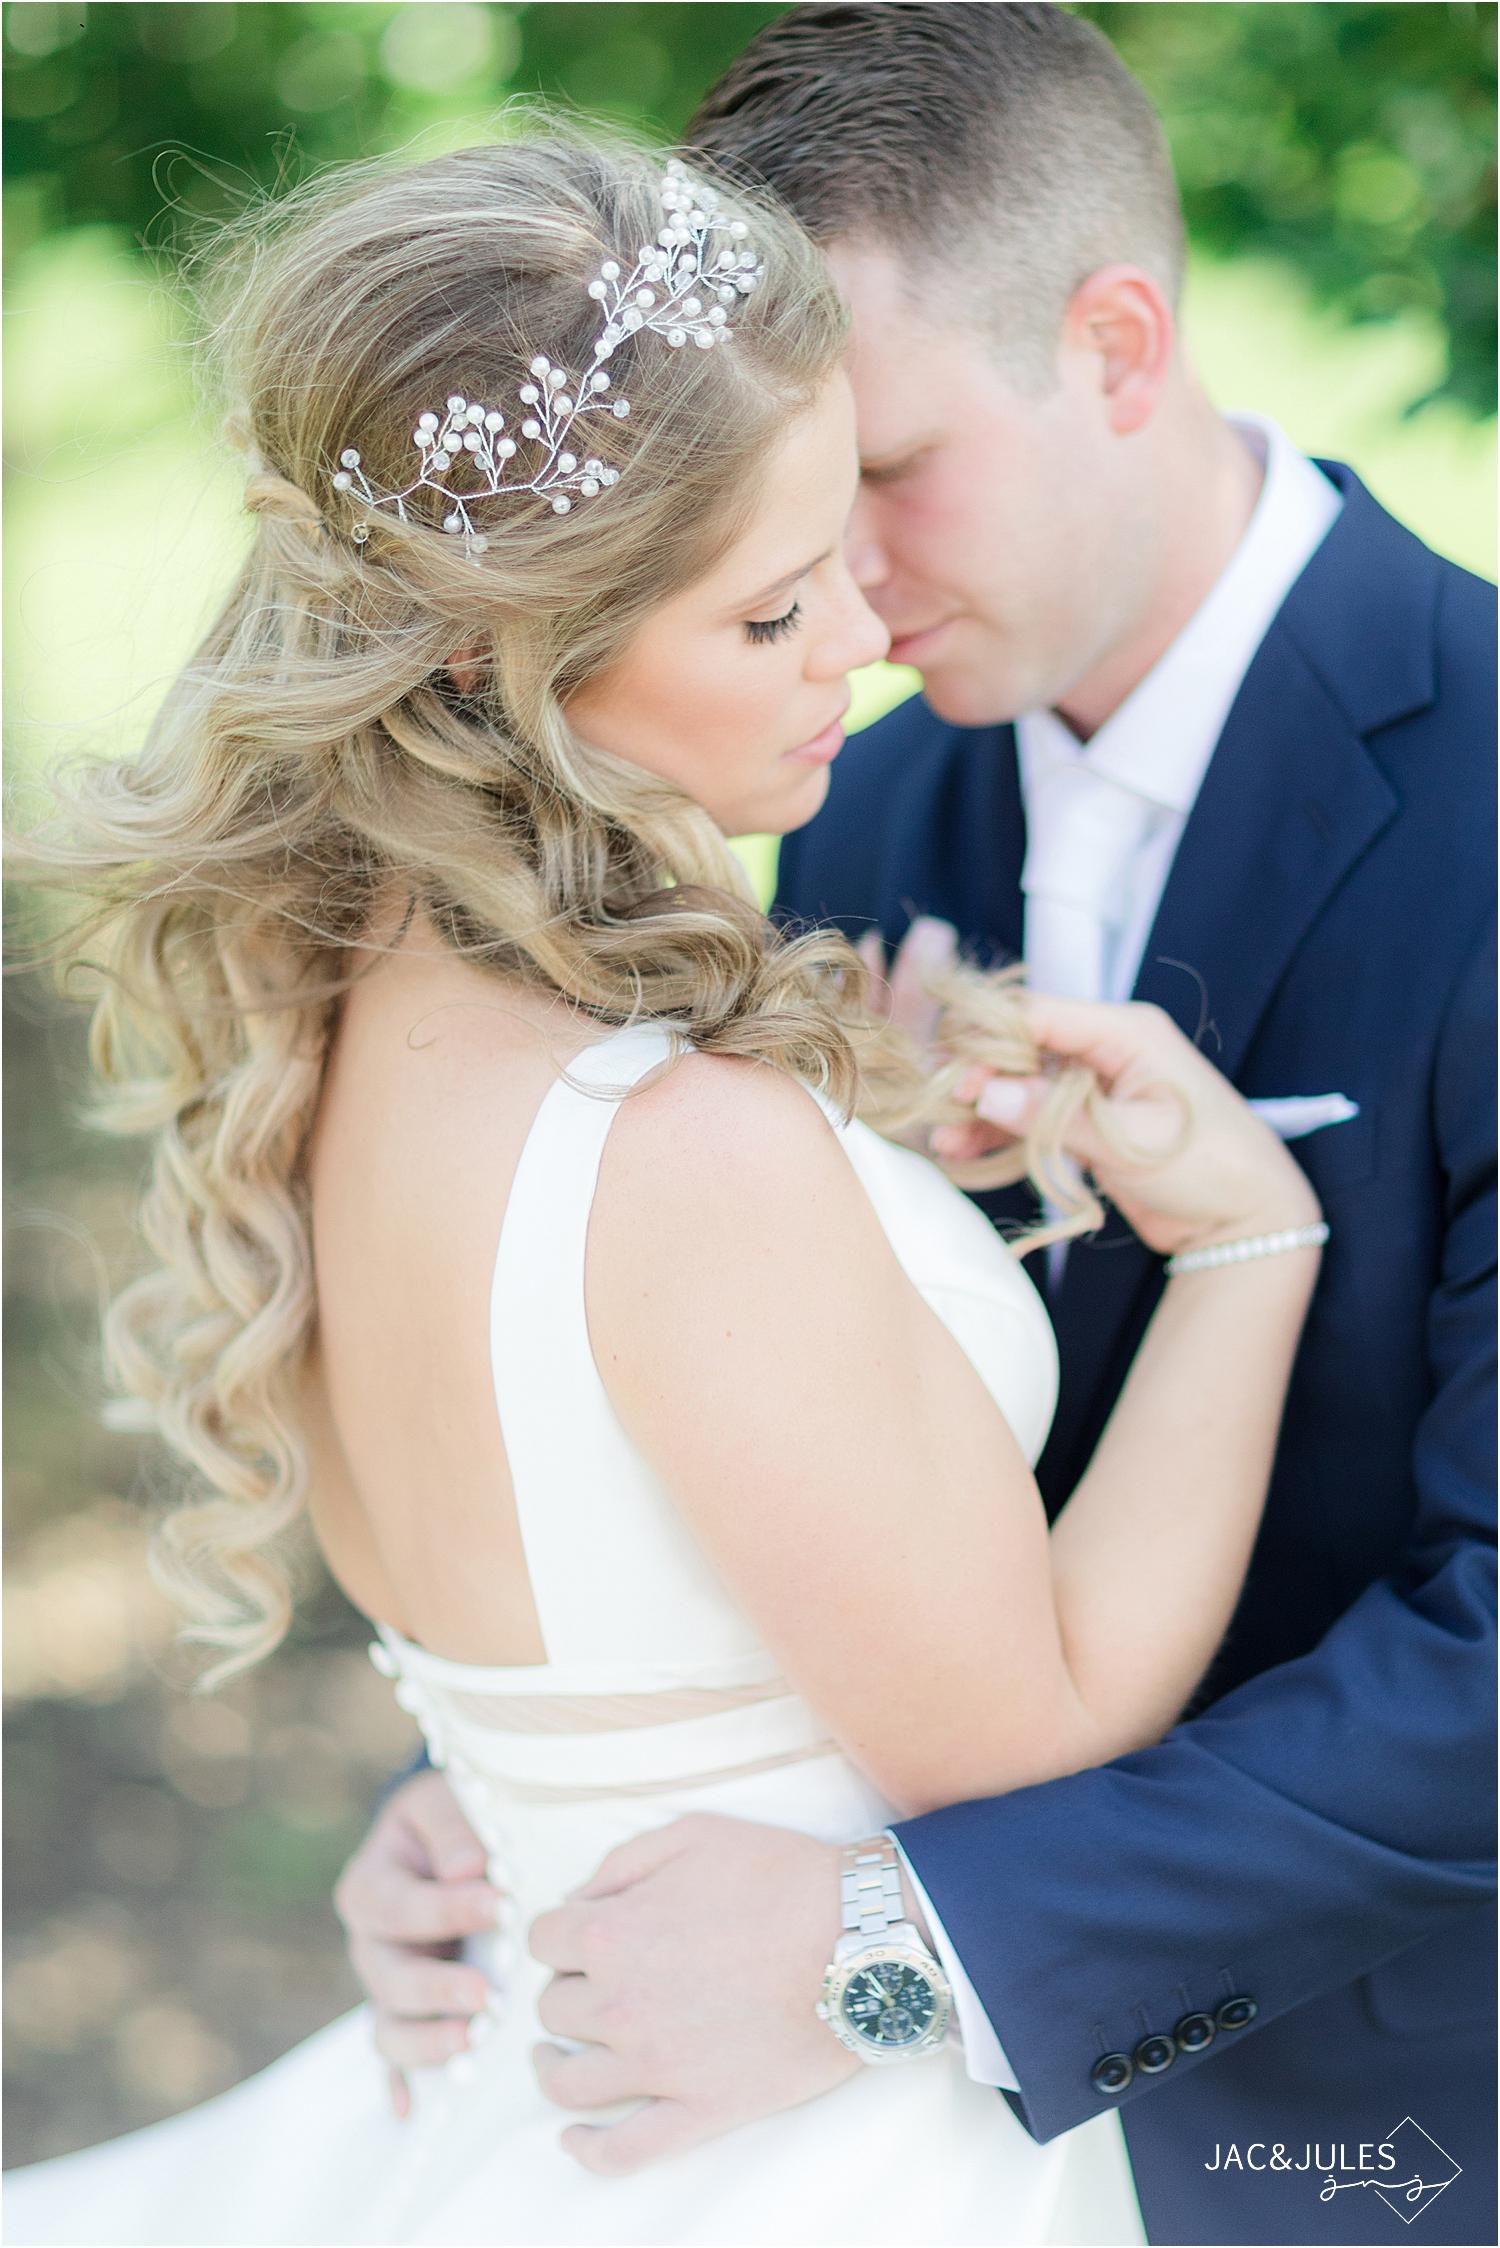 romantic wedding photo at north jersey wedding